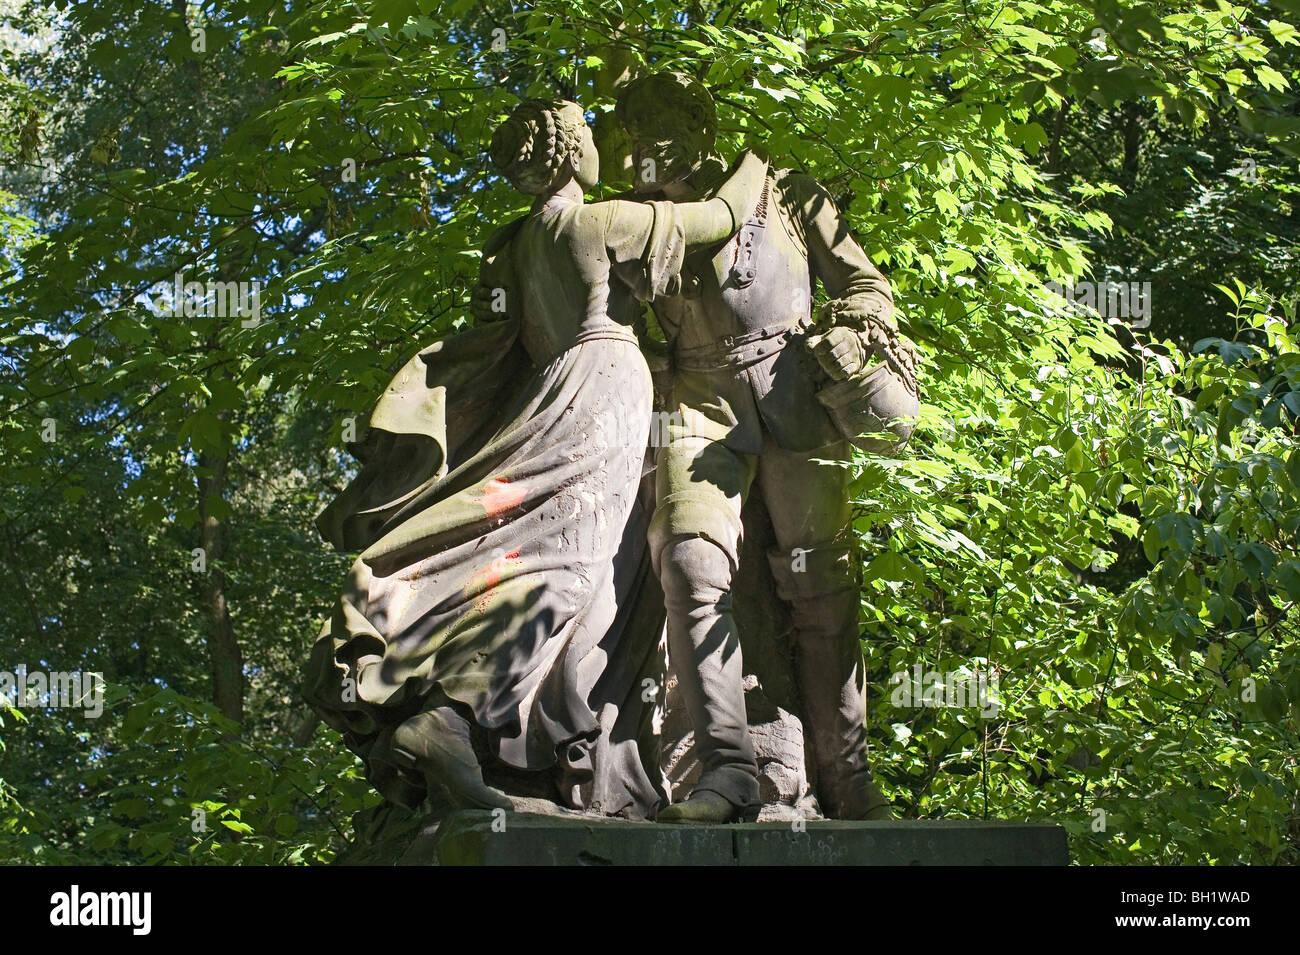 Statue of a couple in Tiergarten, Berlin, Germany - Stock Image